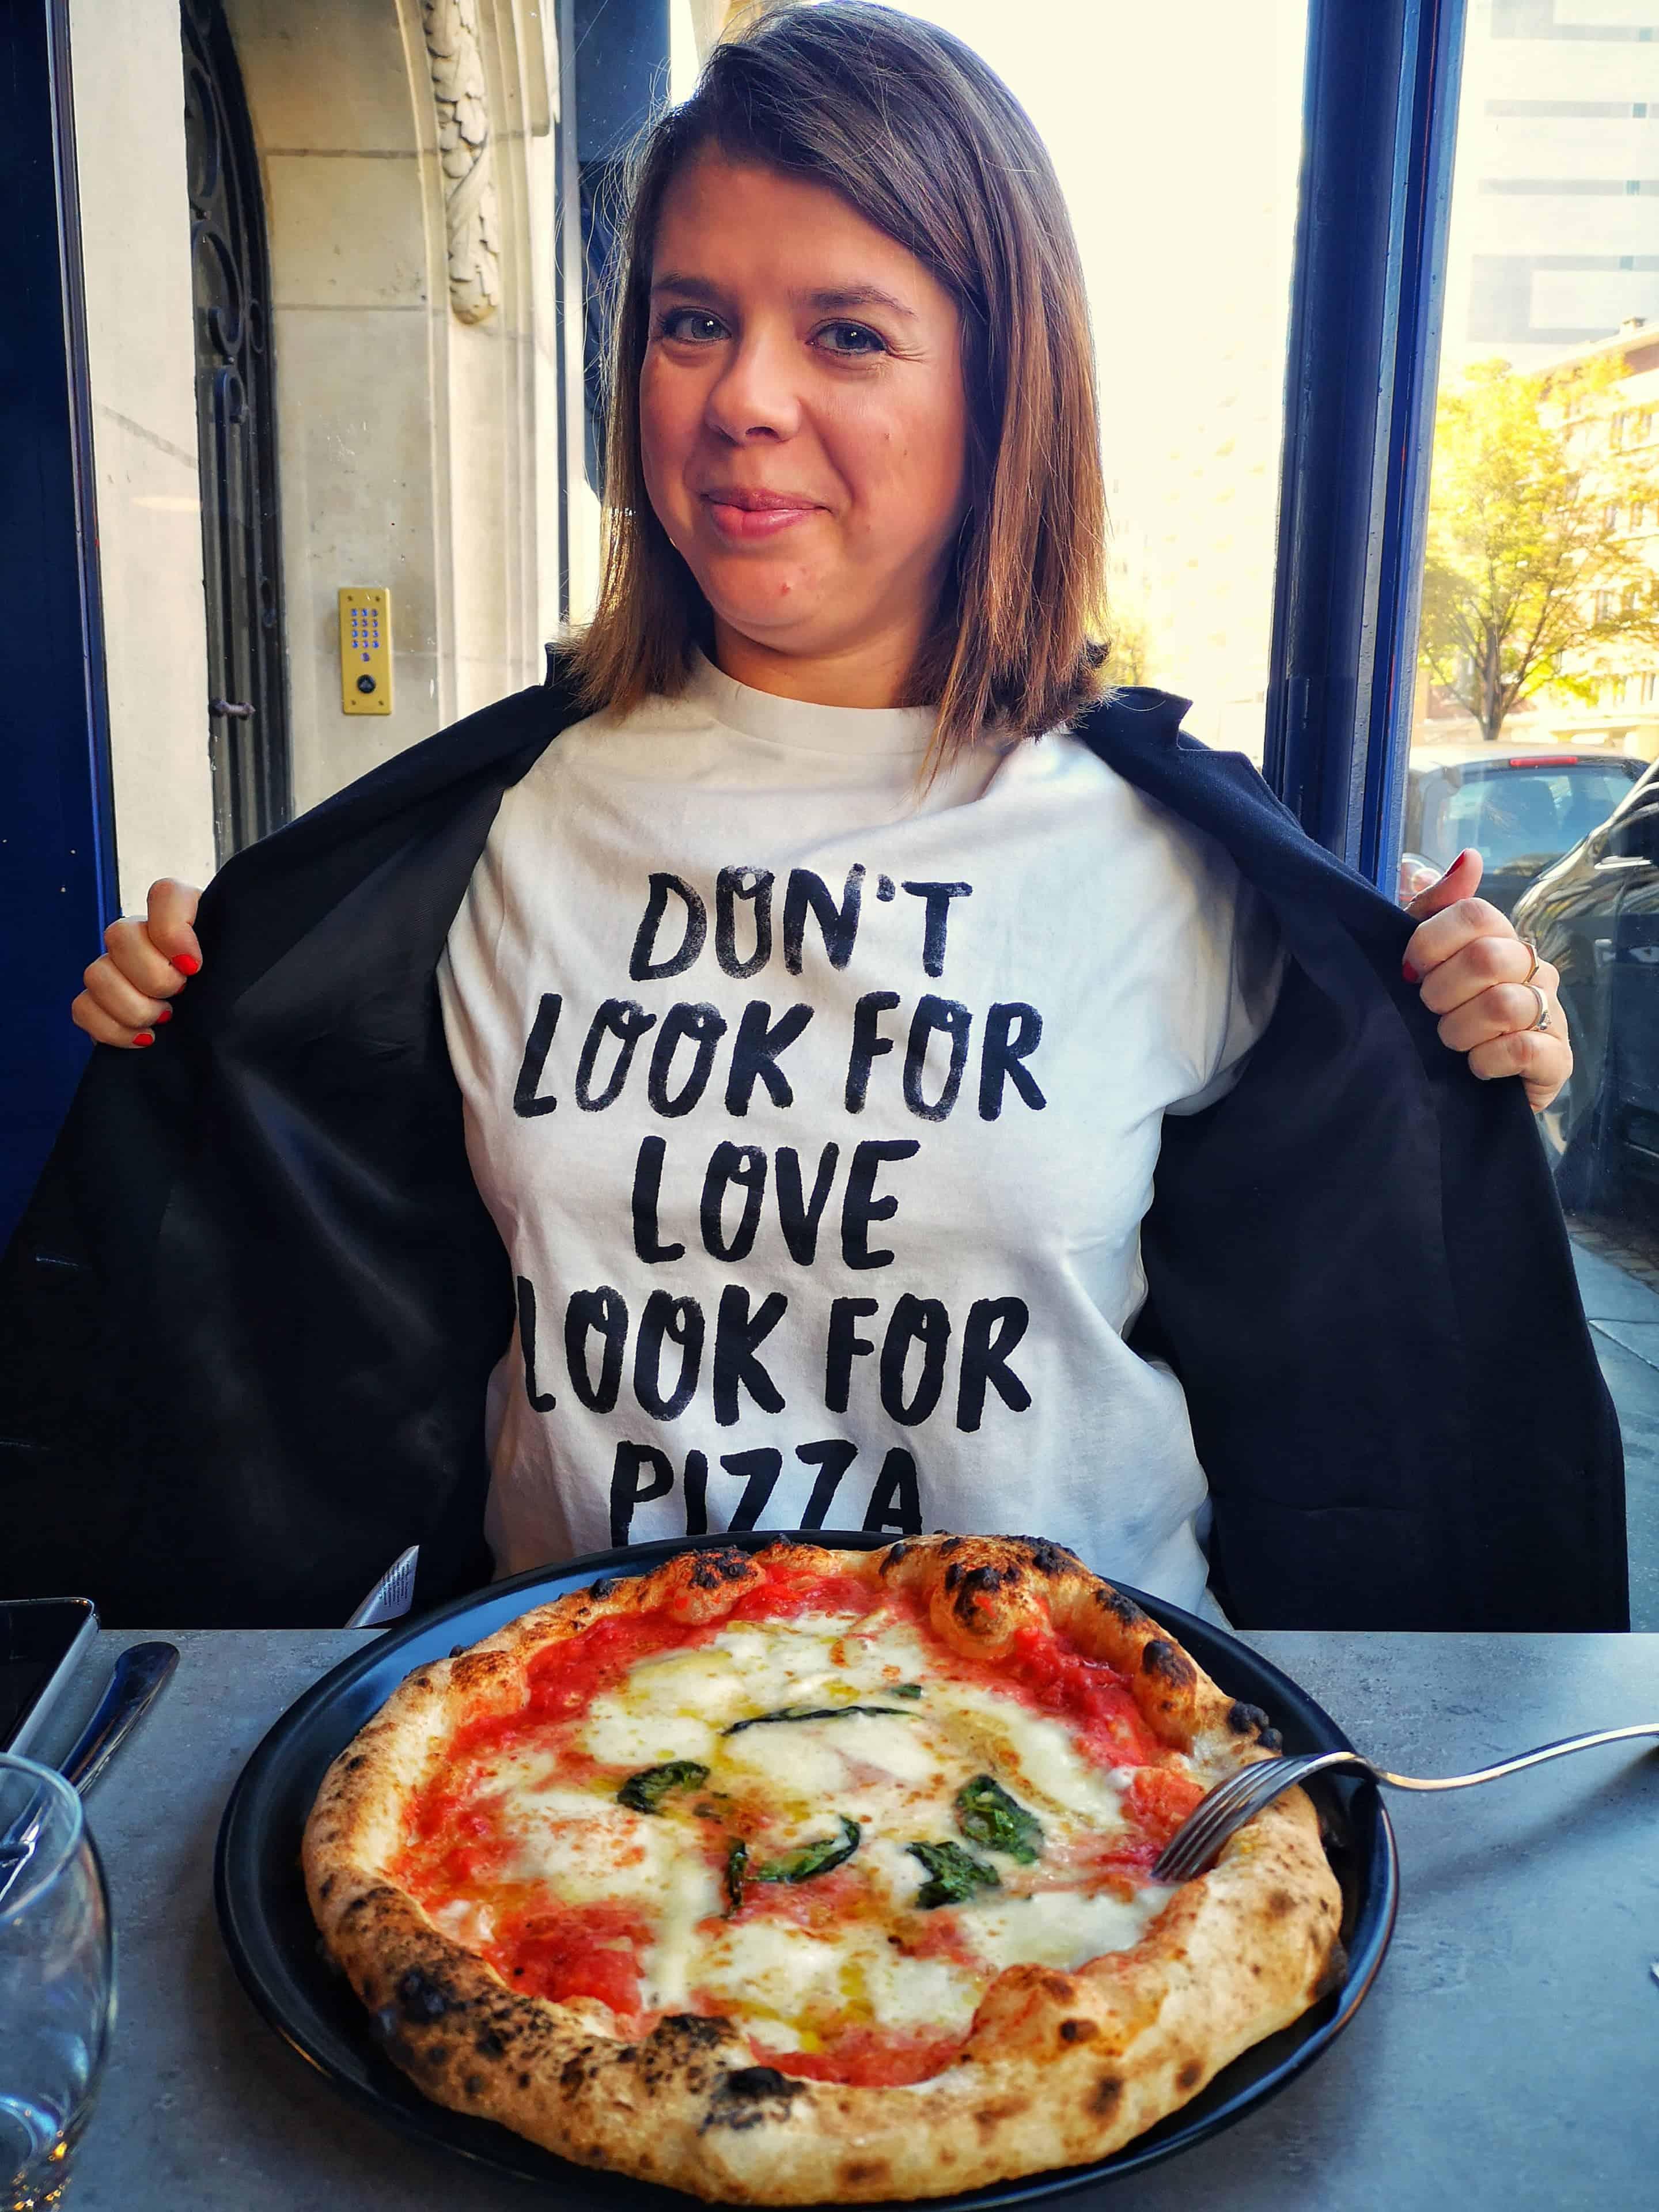 pizzeria-napolitaine-paris-15e-guillaume-grasso